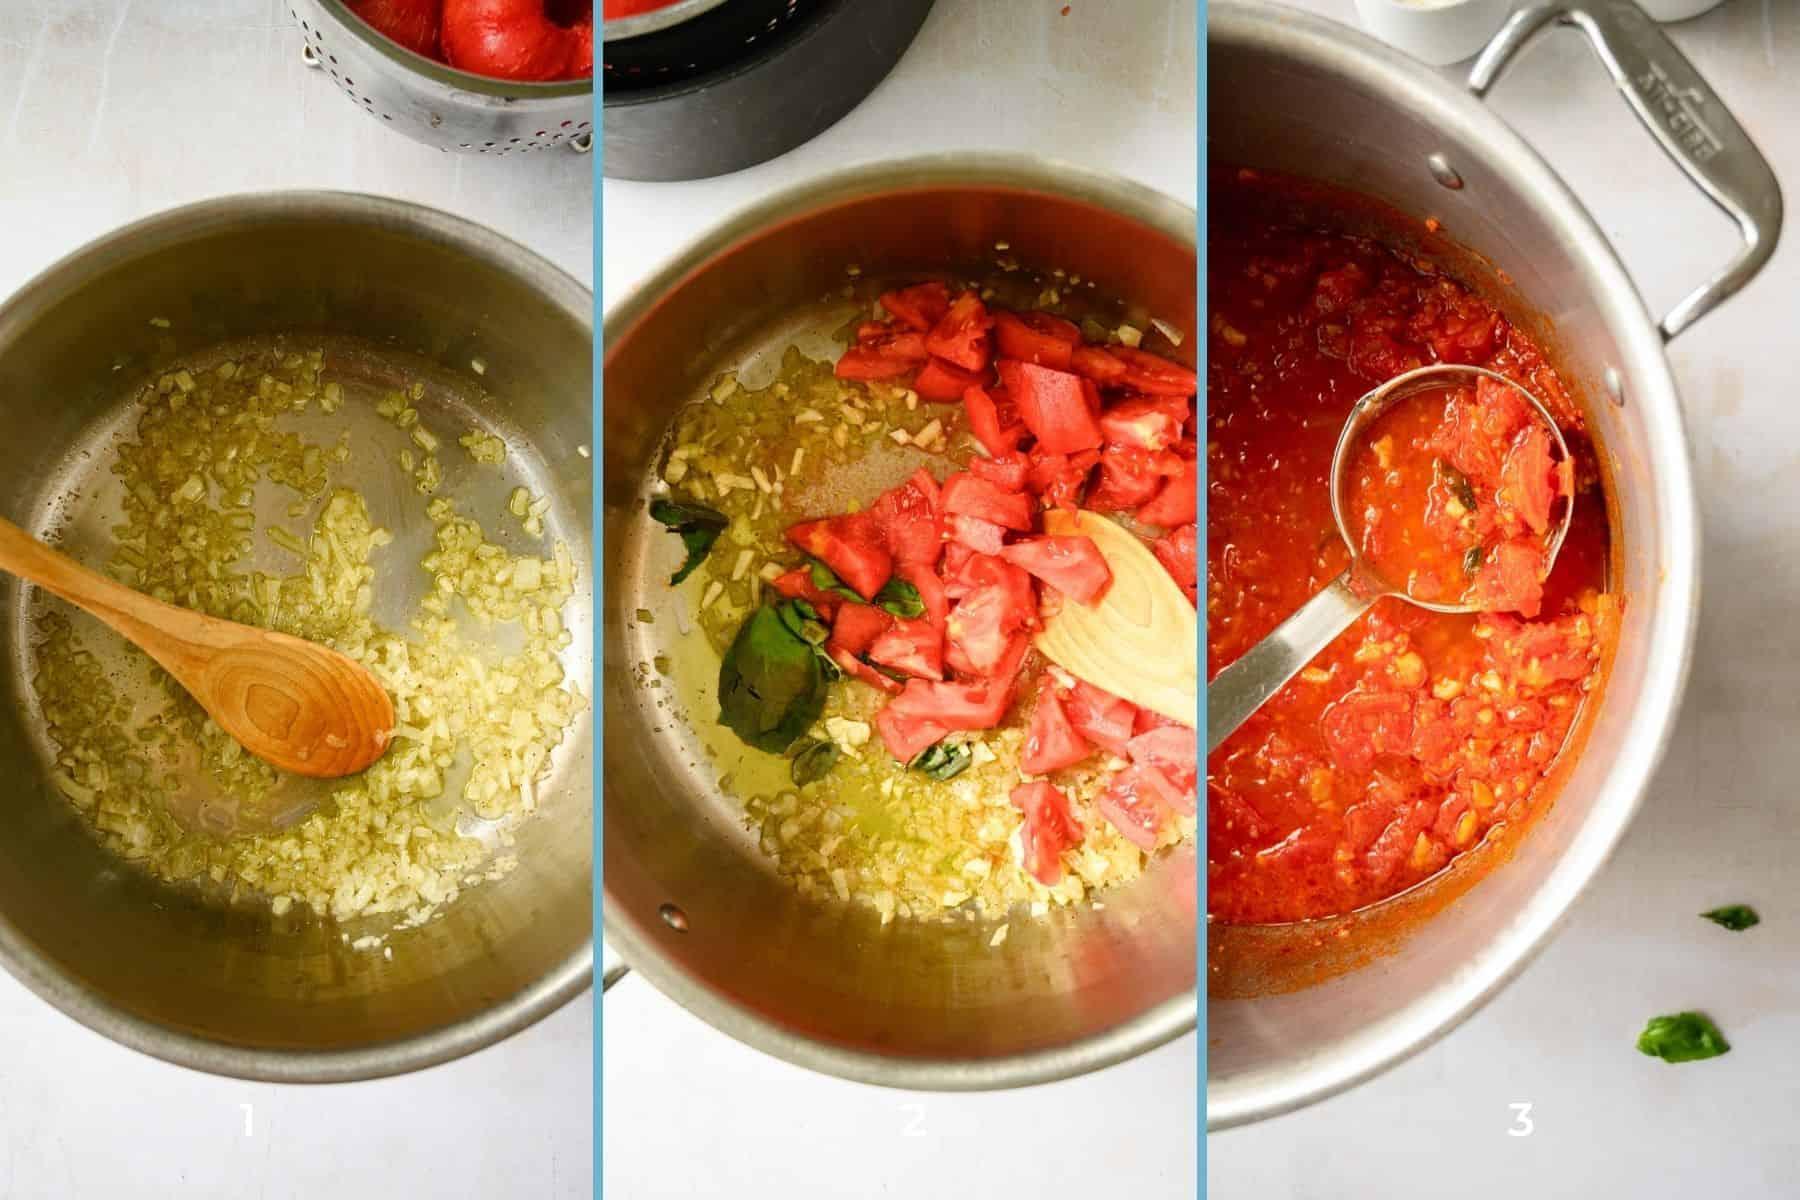 three pots of sauteed onions, tomatoes and homemade marinara sauce